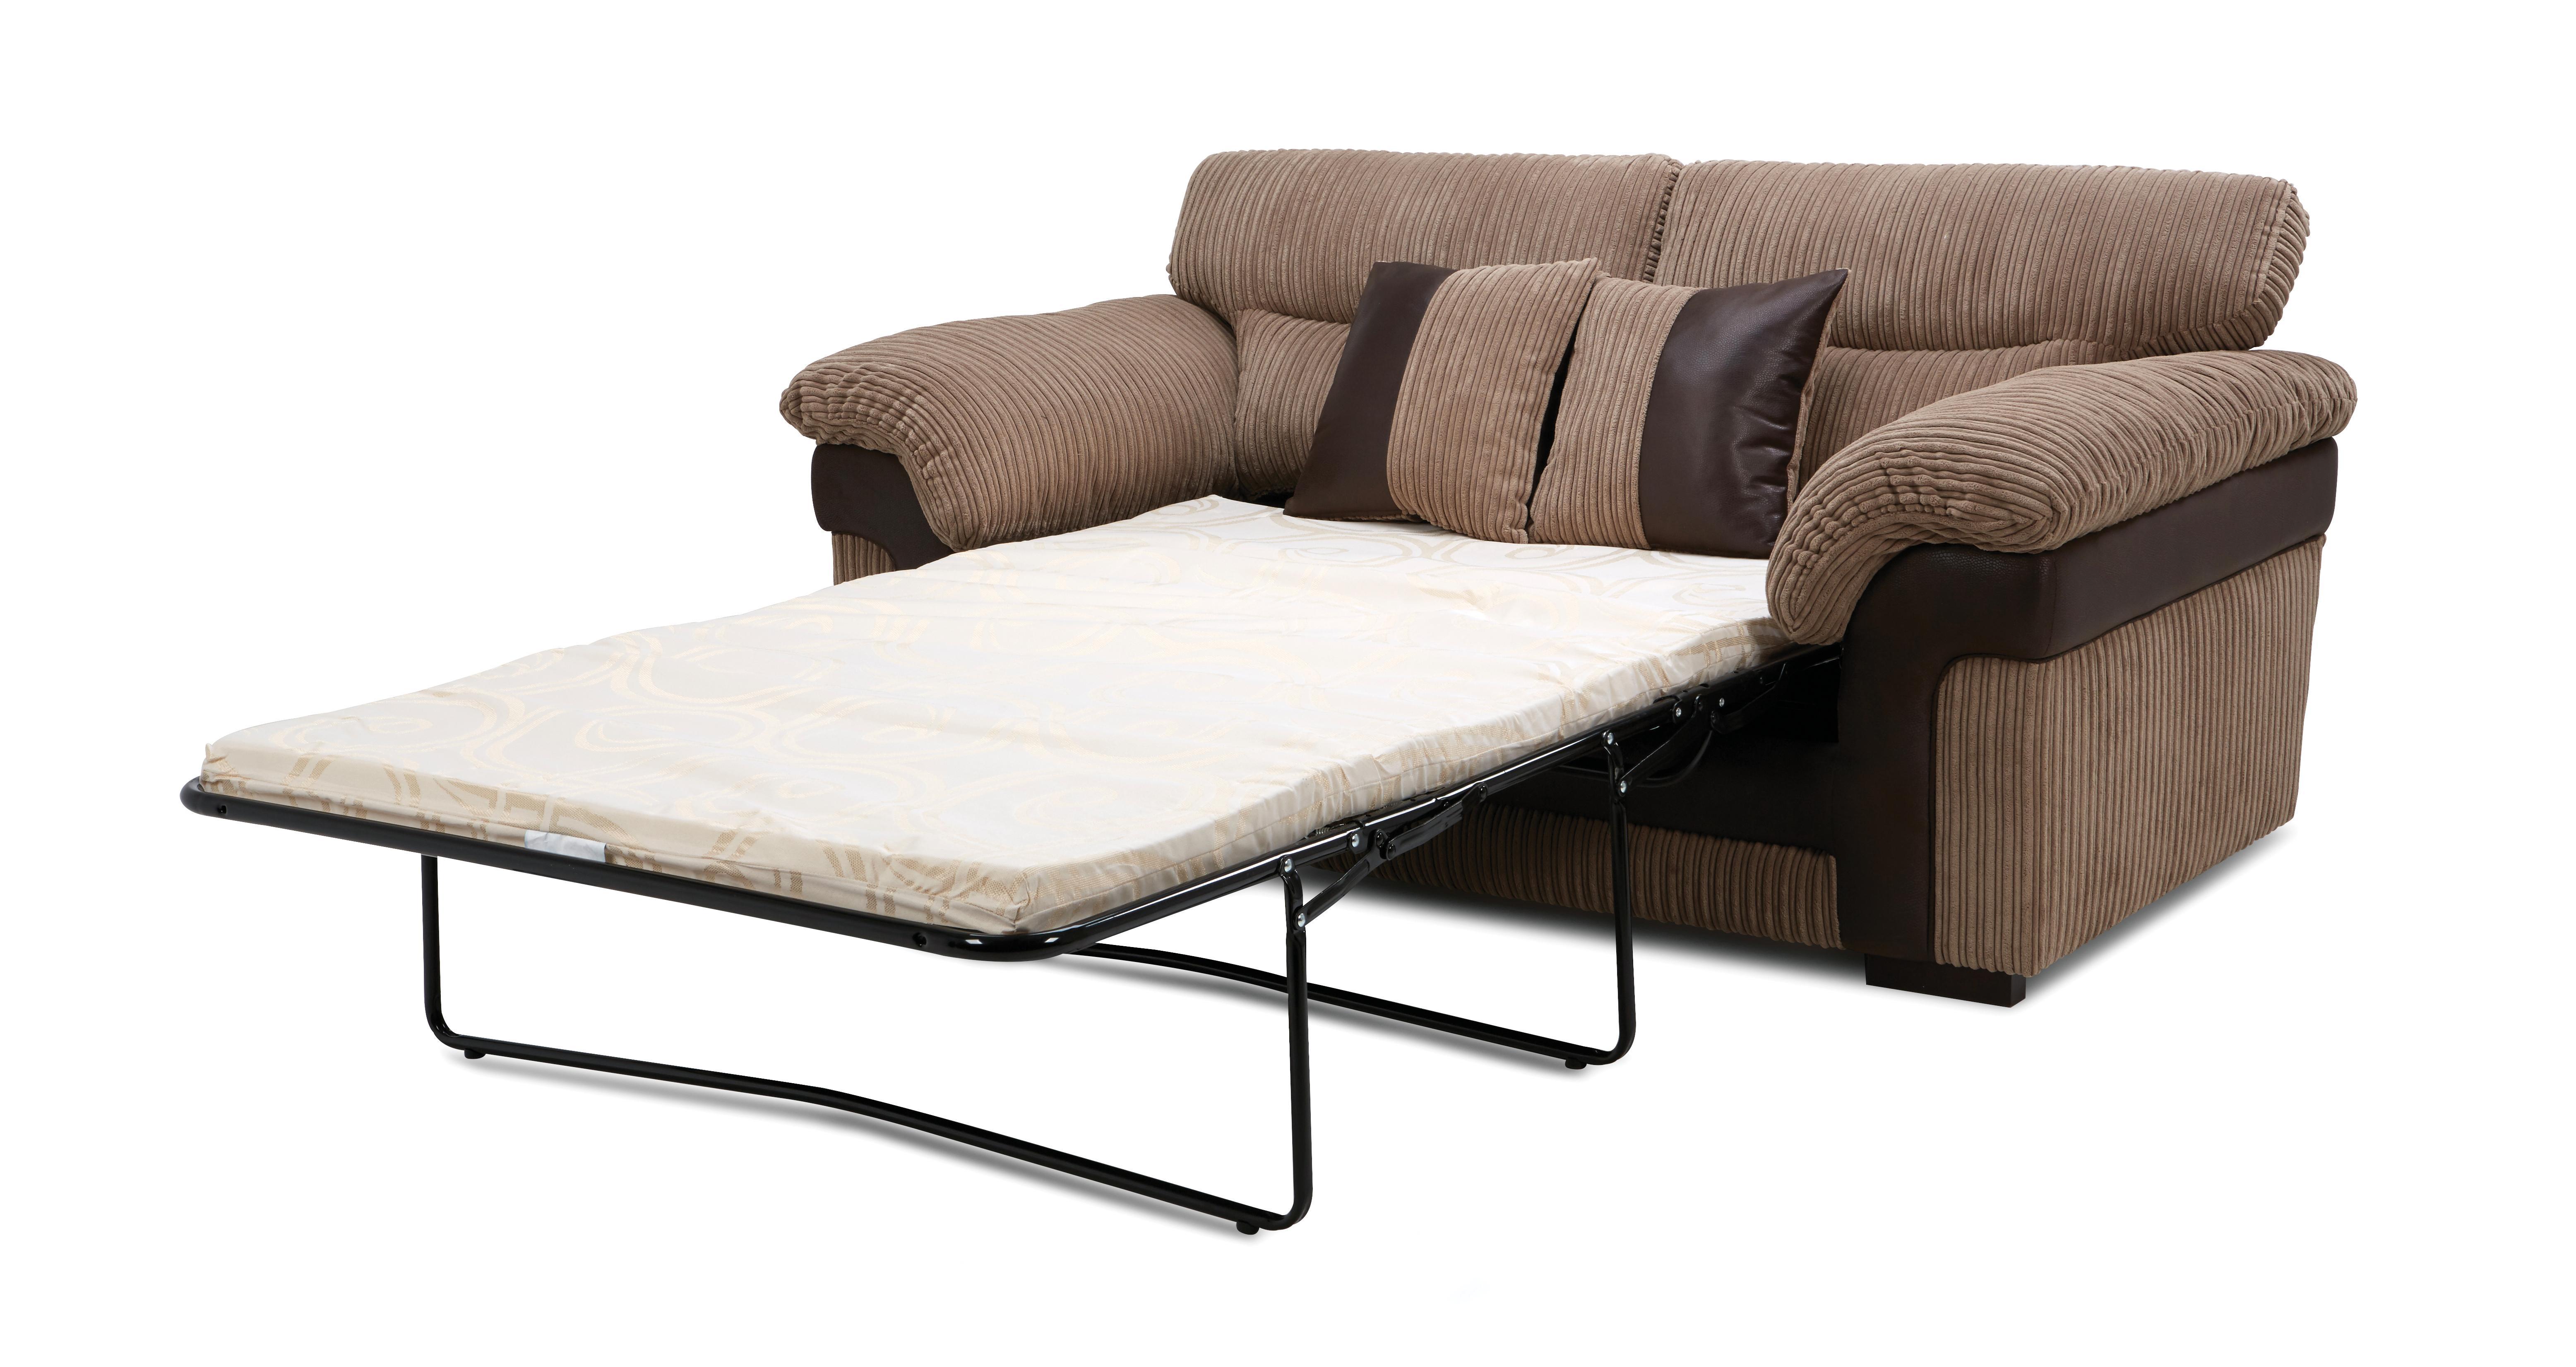 clearance sofa beds uk secional saxon large 2 seater bed samson dfs